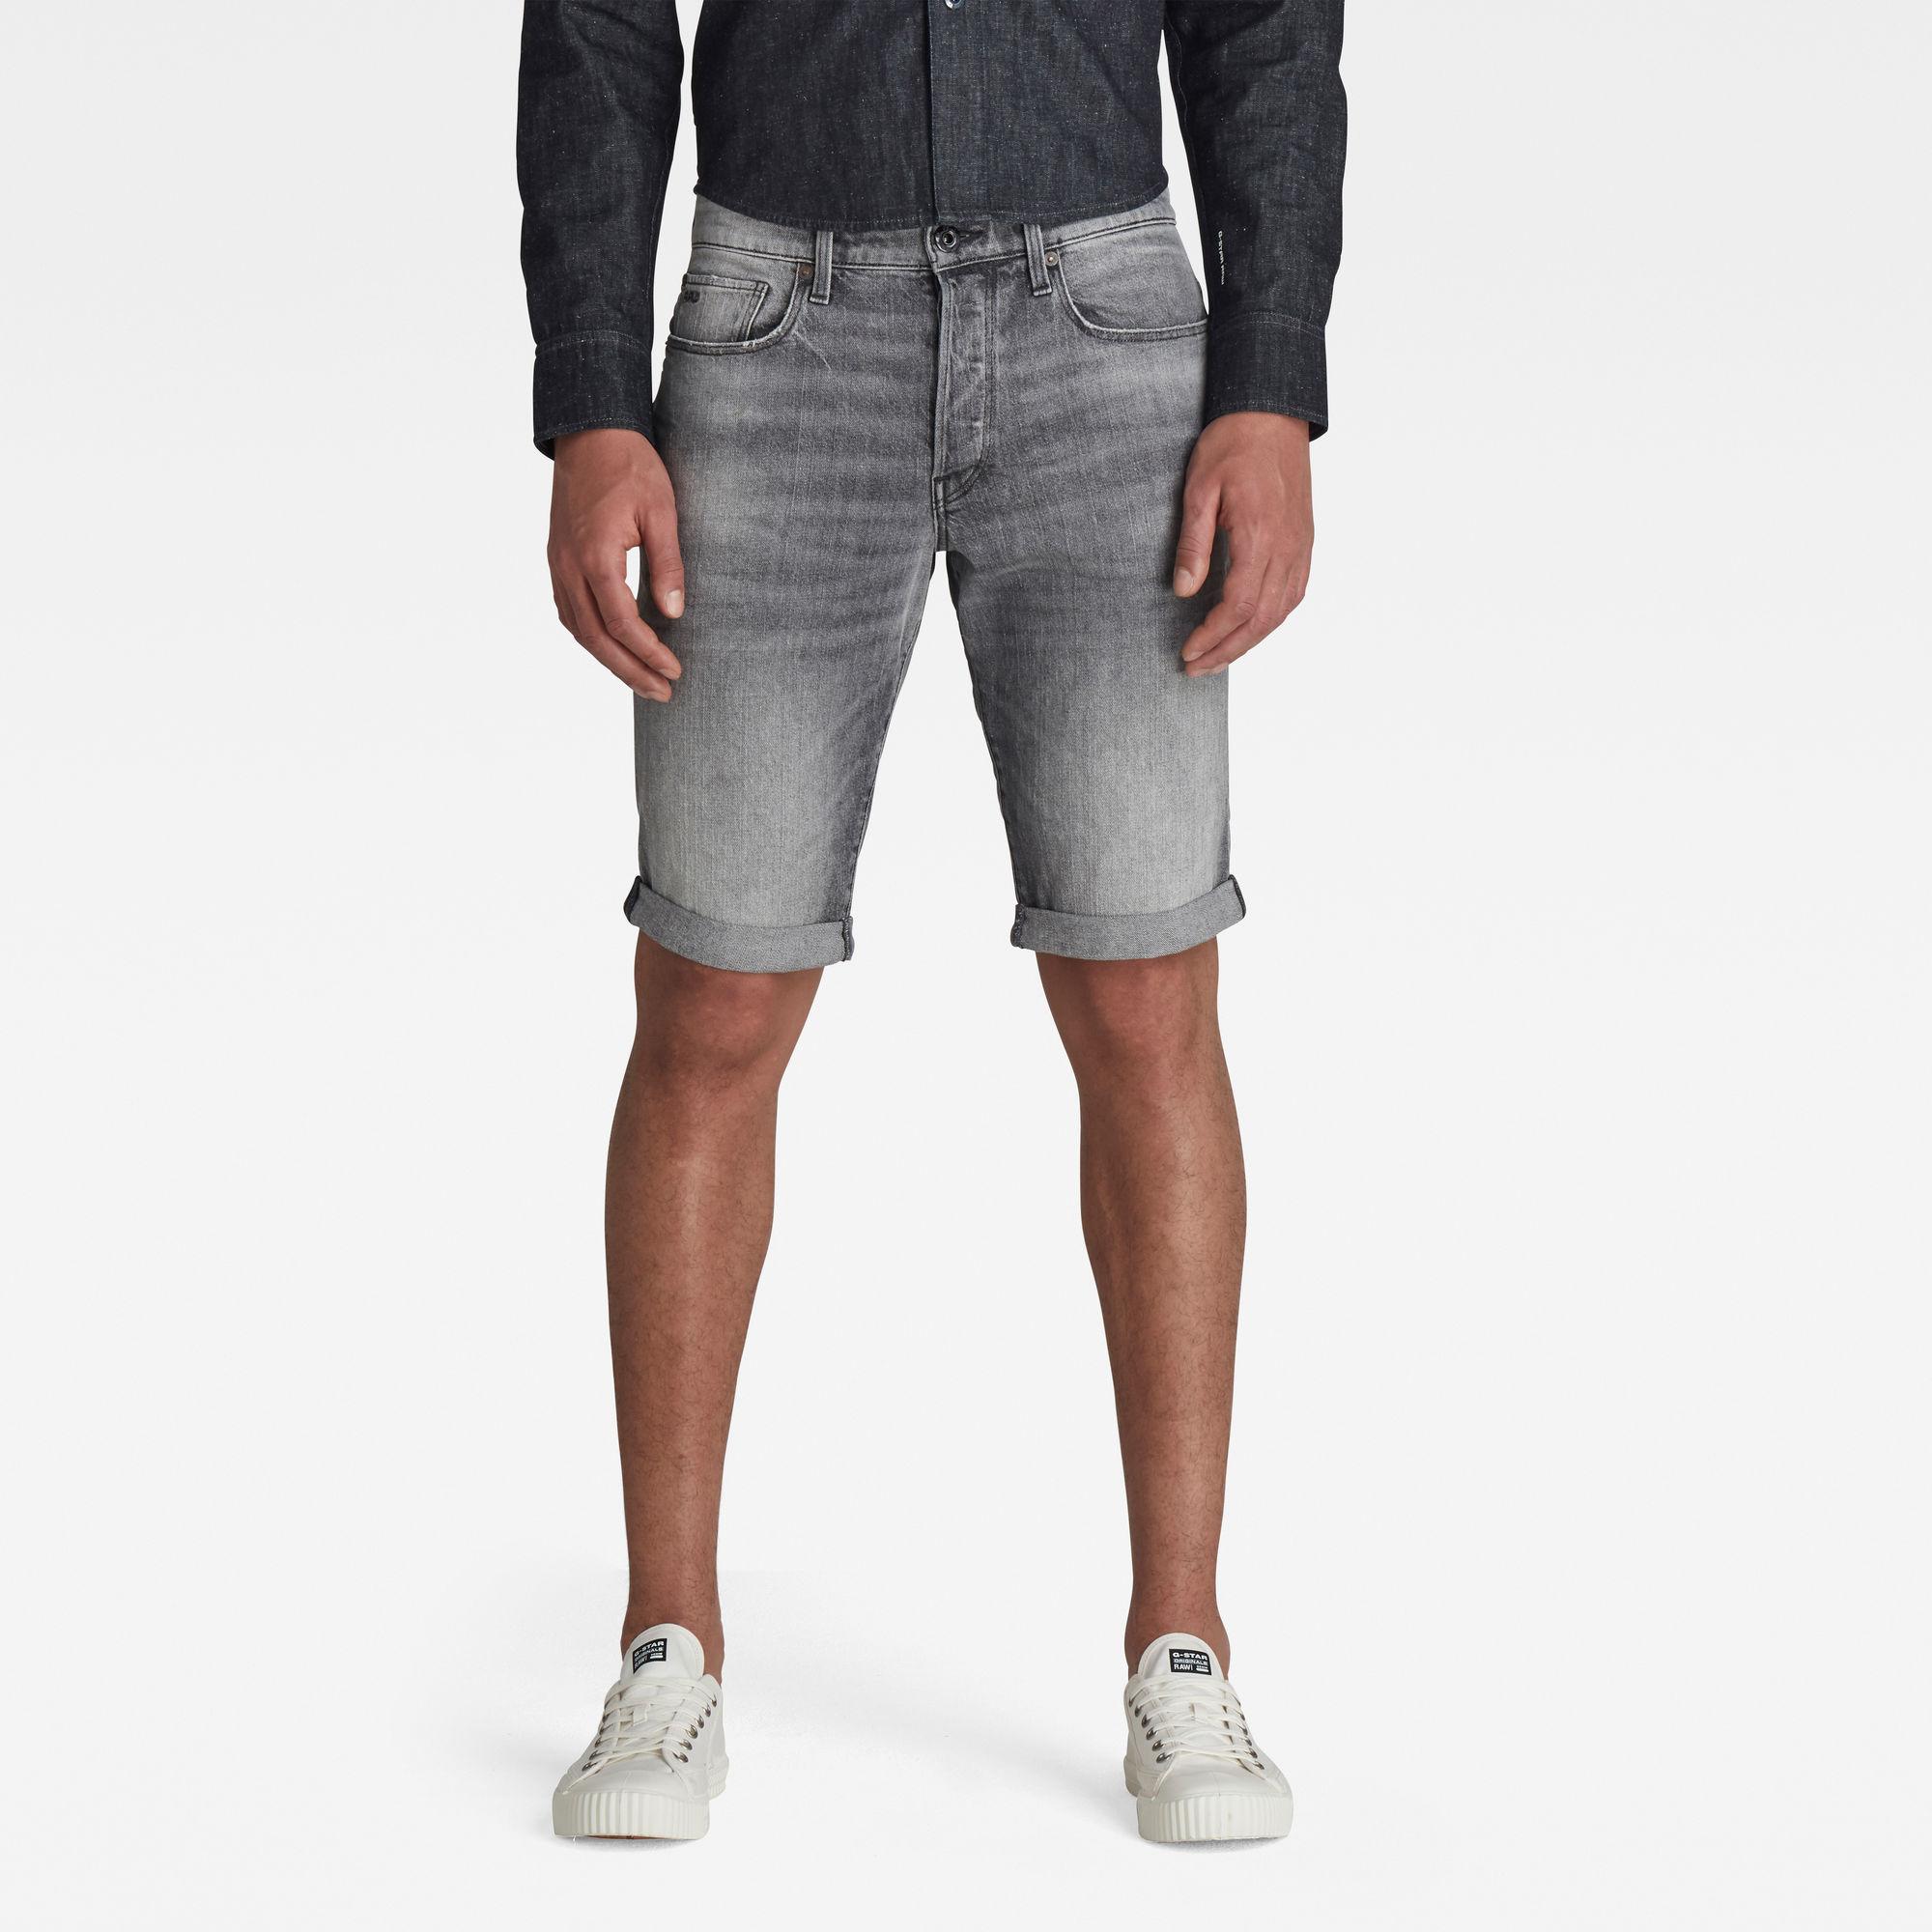 G-Star RAW Heren 3301 Denim Shorts Grijs